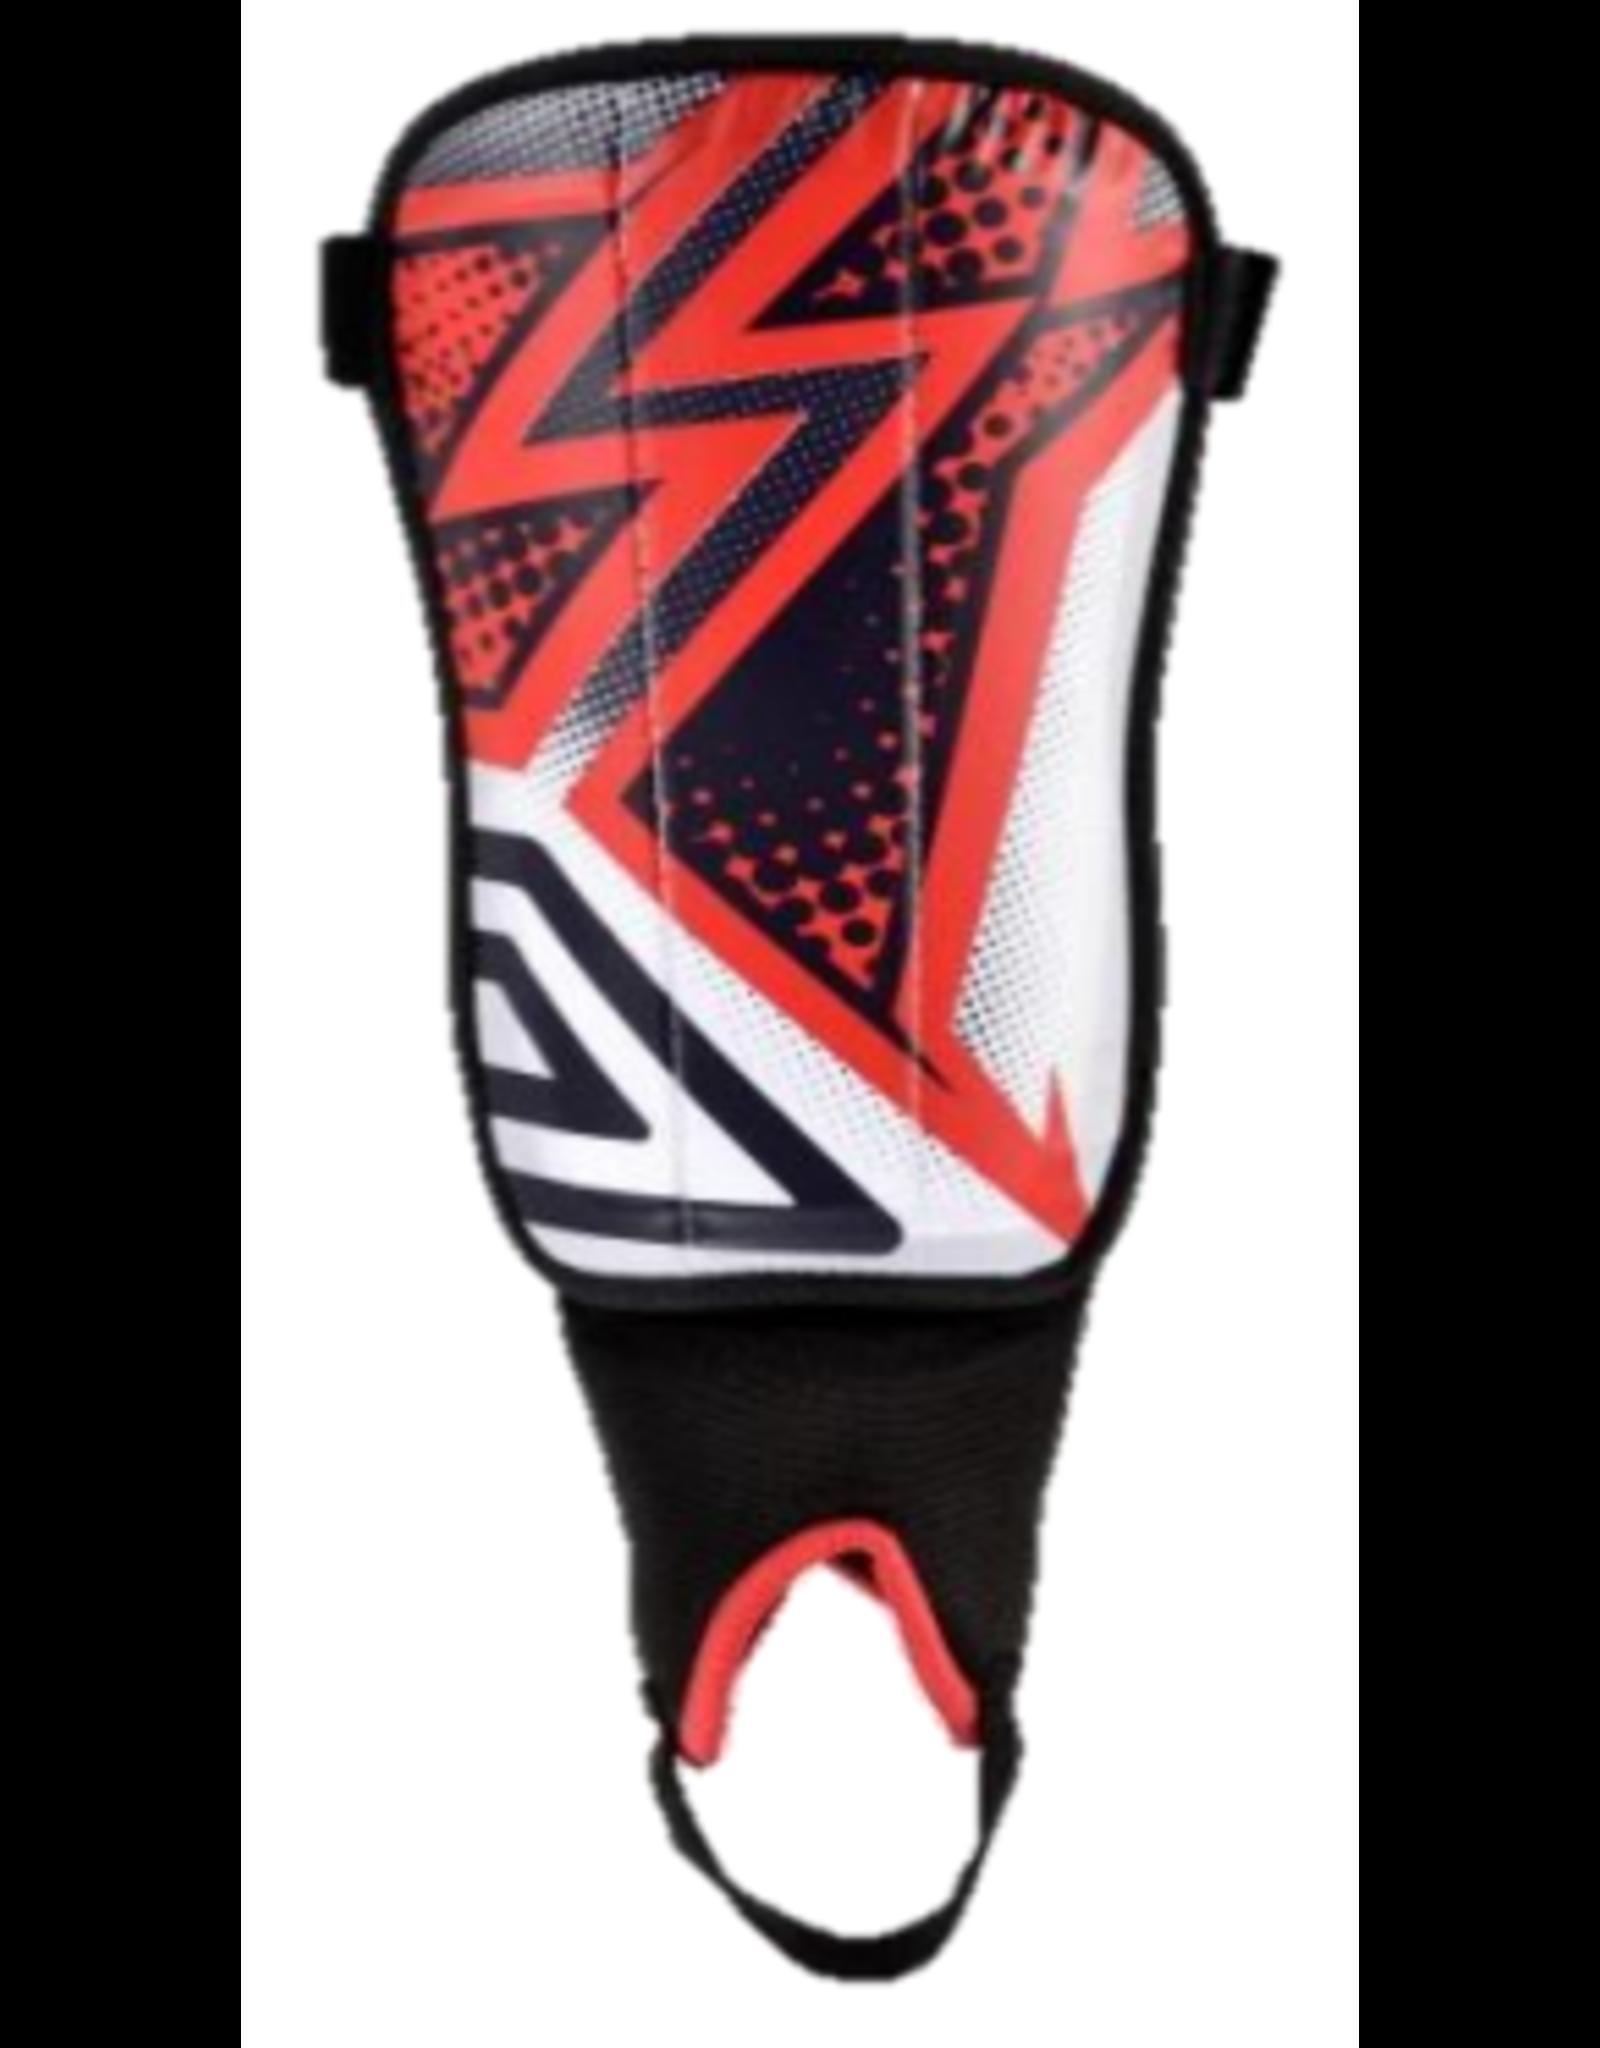 Umbro Umbro Neo Flexi Guard (Red/White/Eclipse)